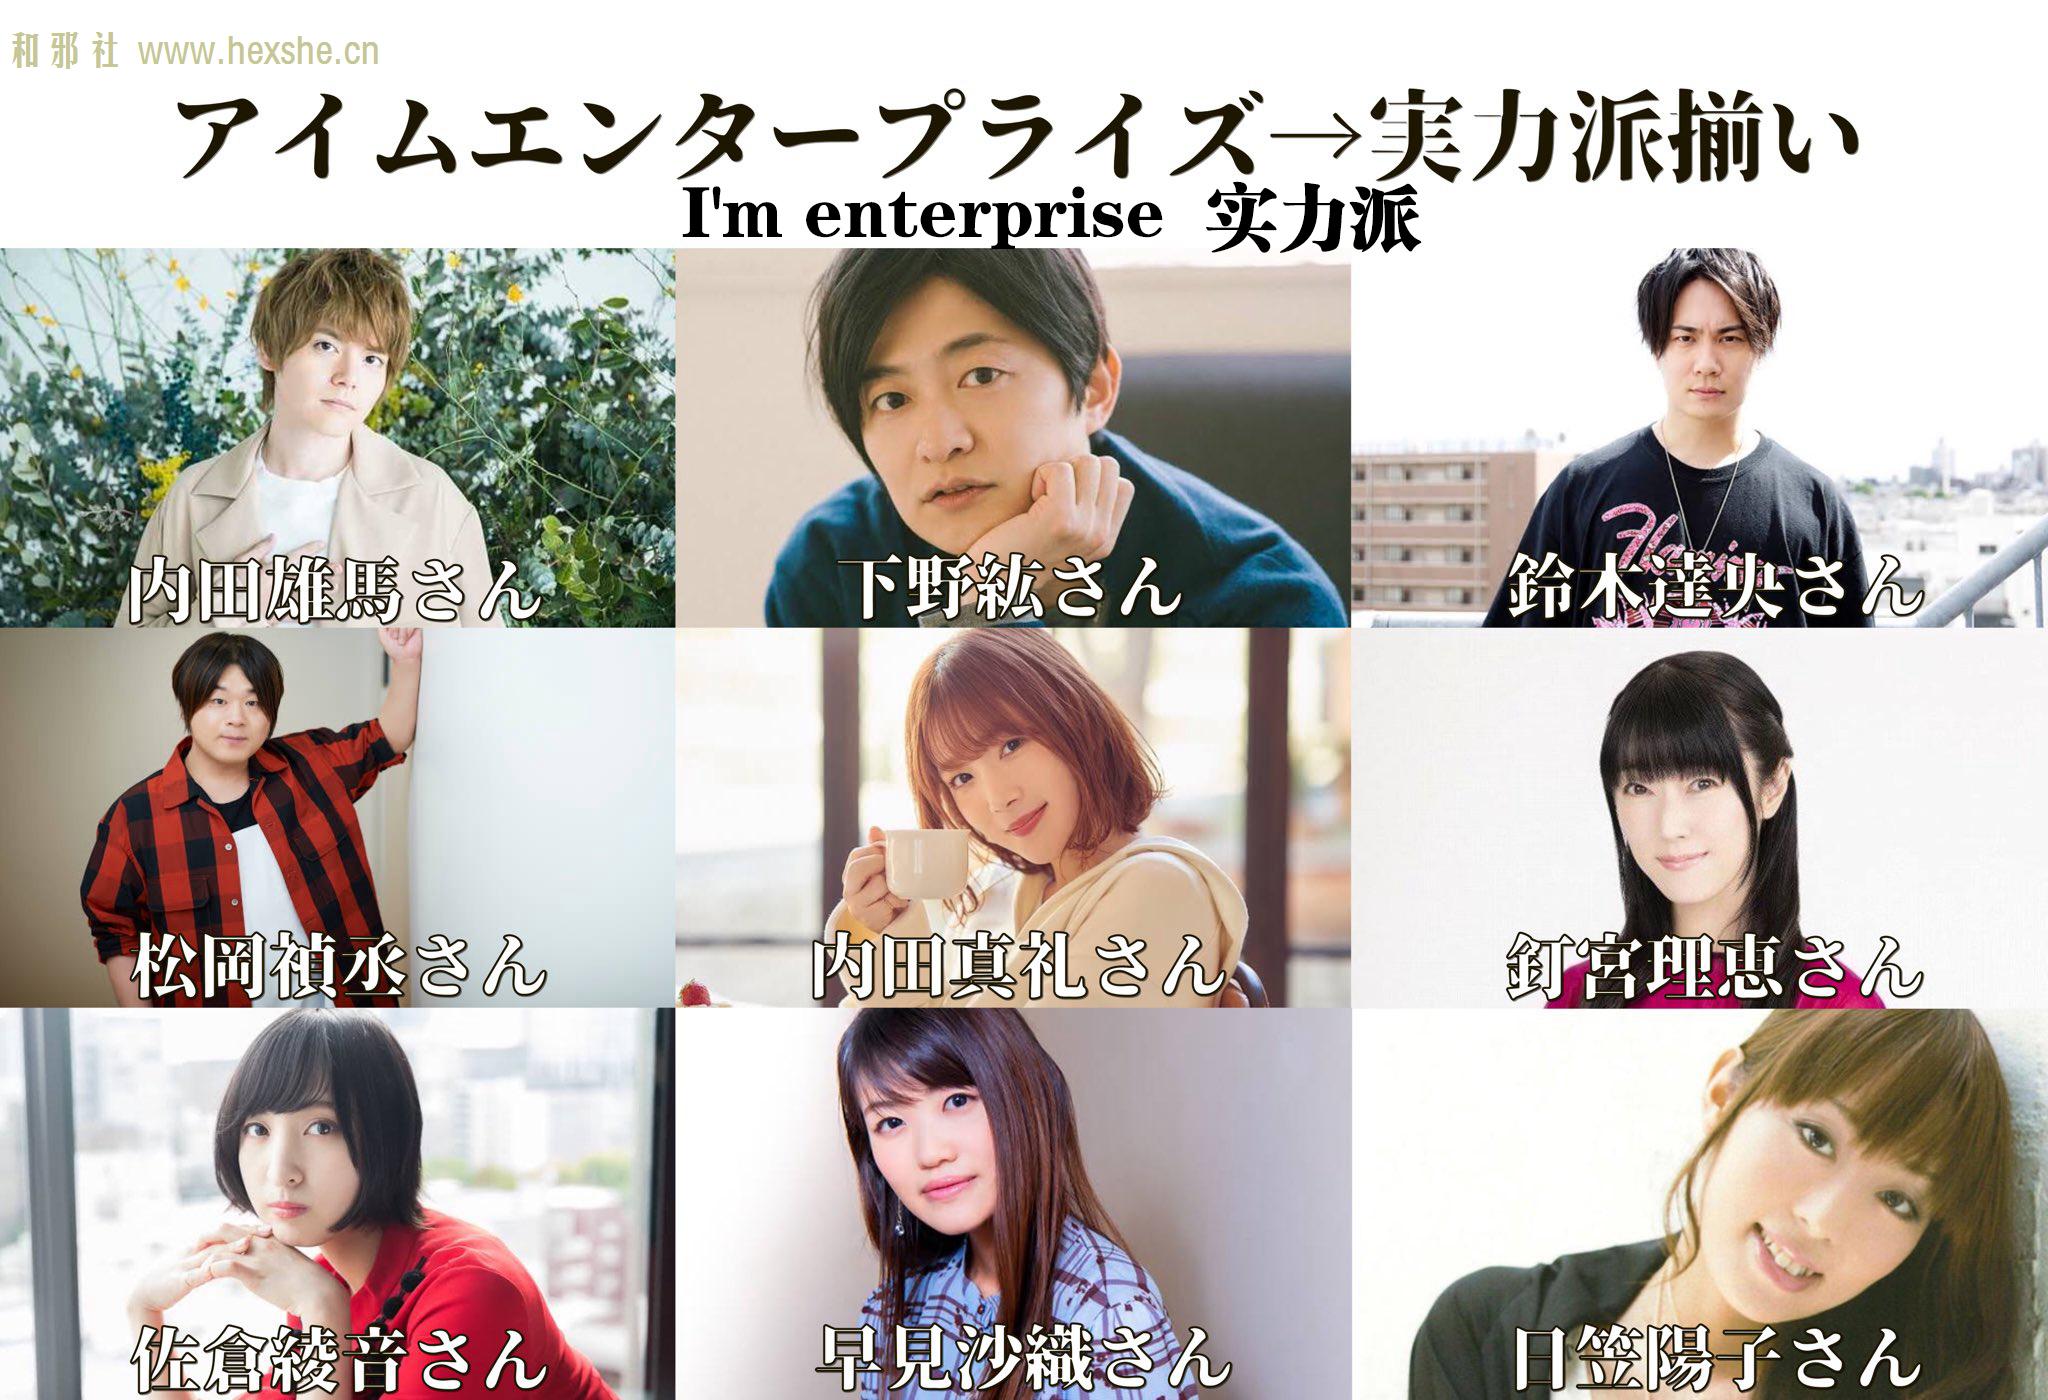 I'm enterprise